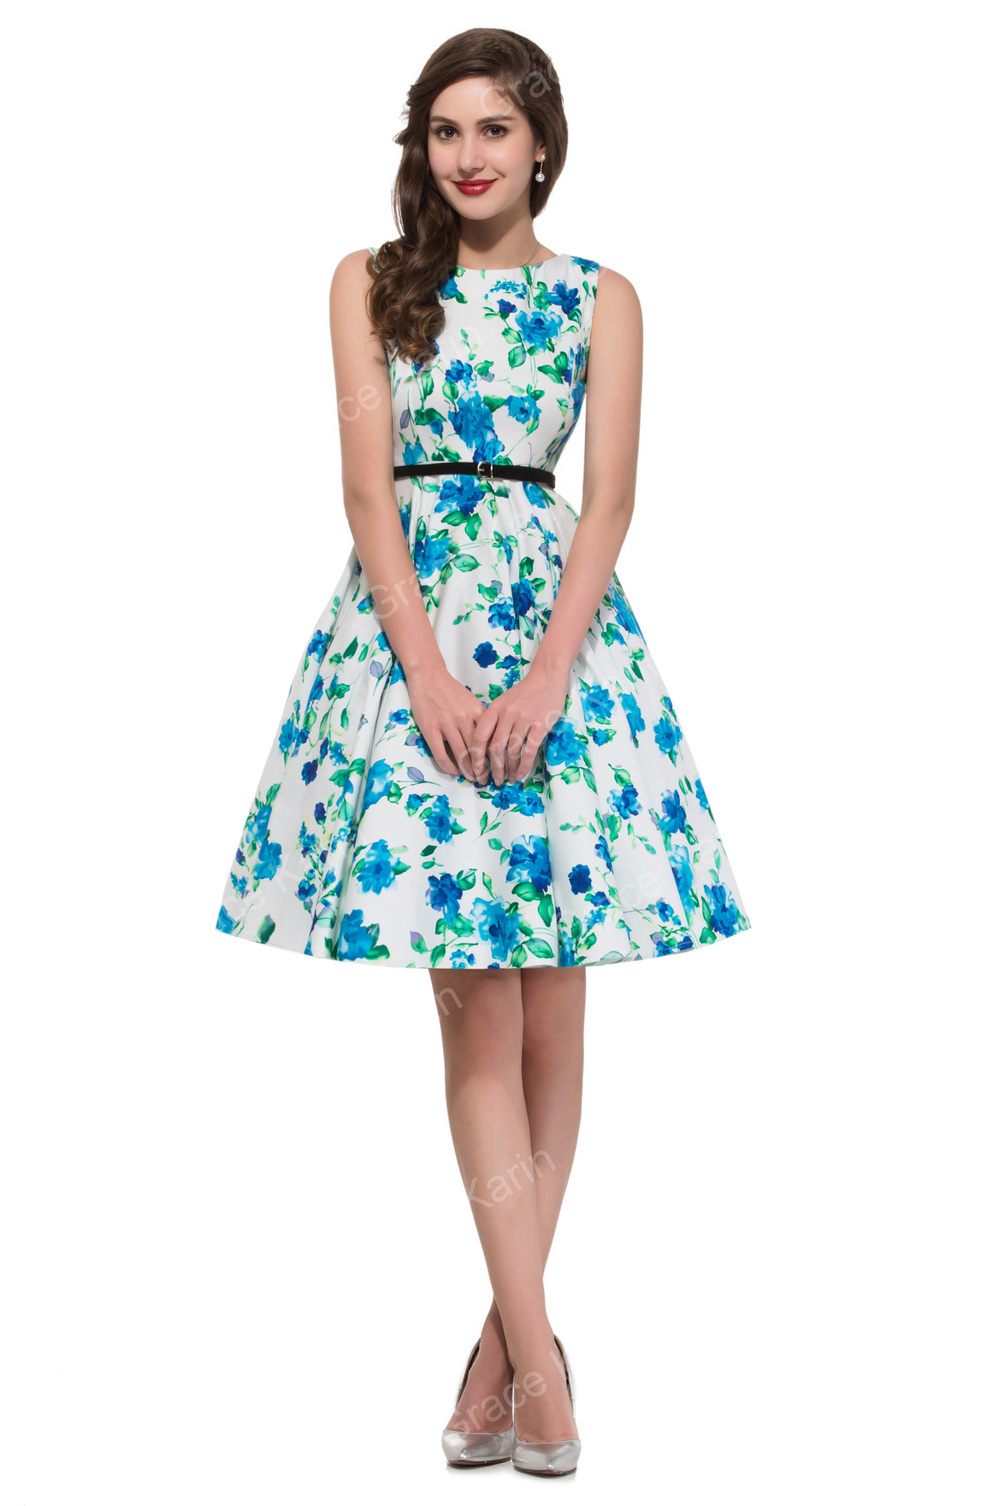 plus size dresses rockabilly gallery